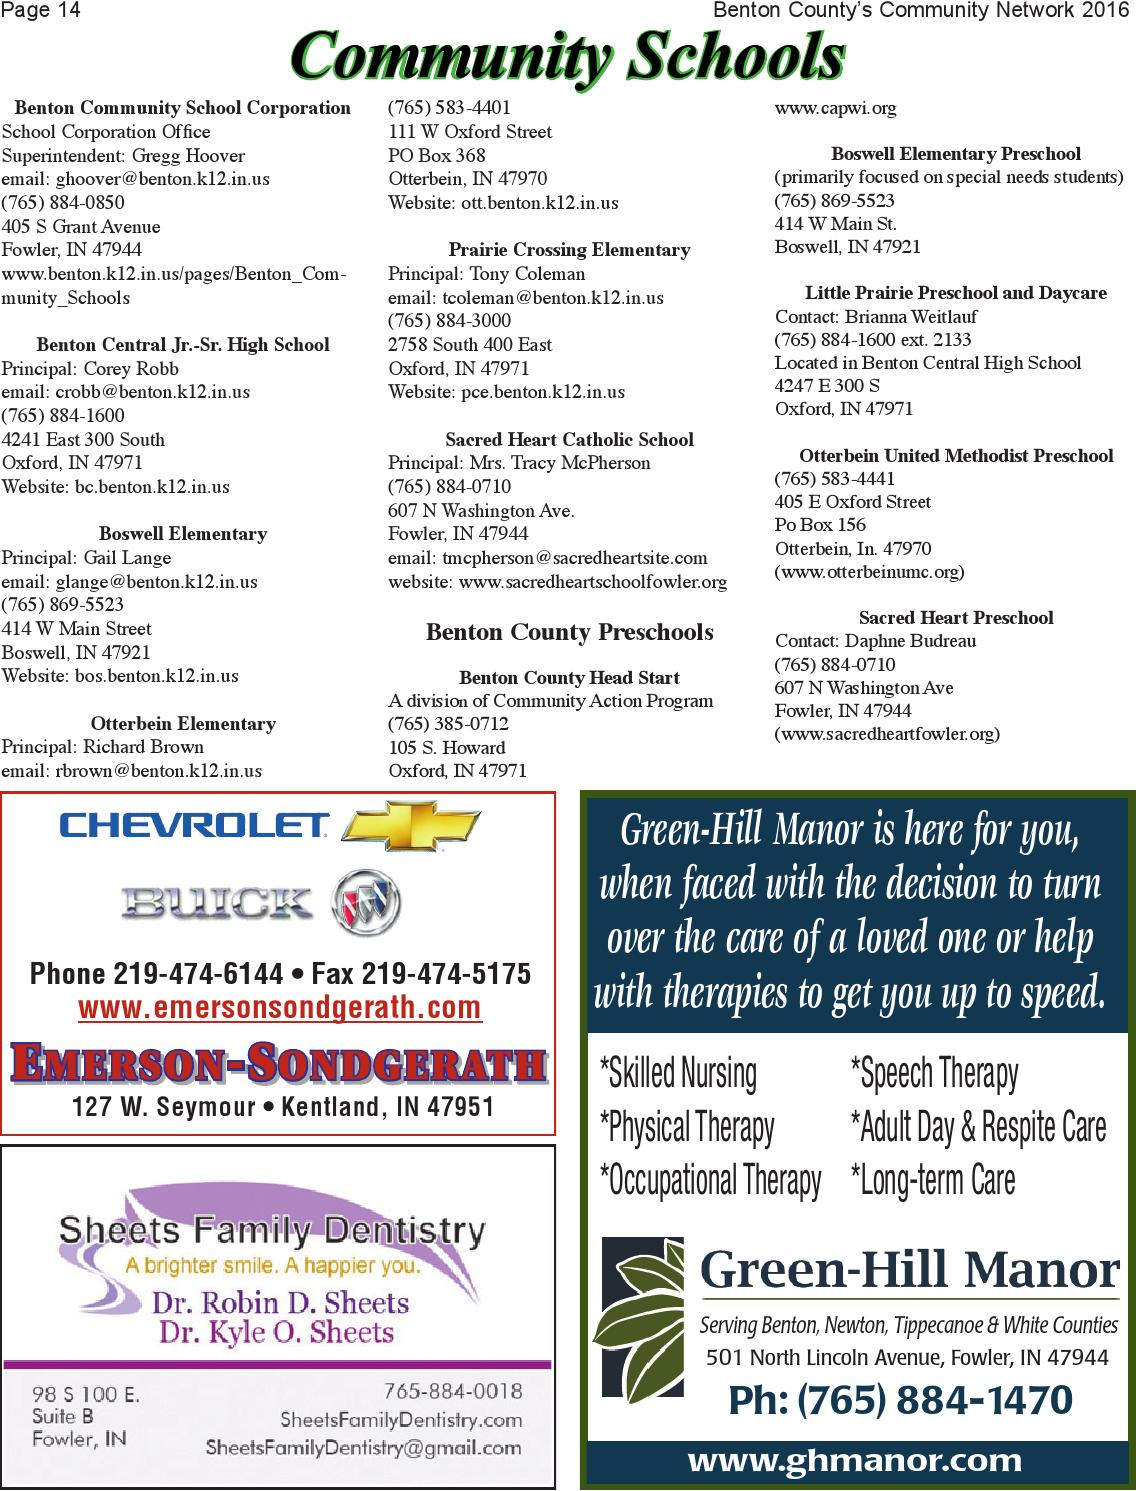 Benton County, Indiana Community Network by Newton County